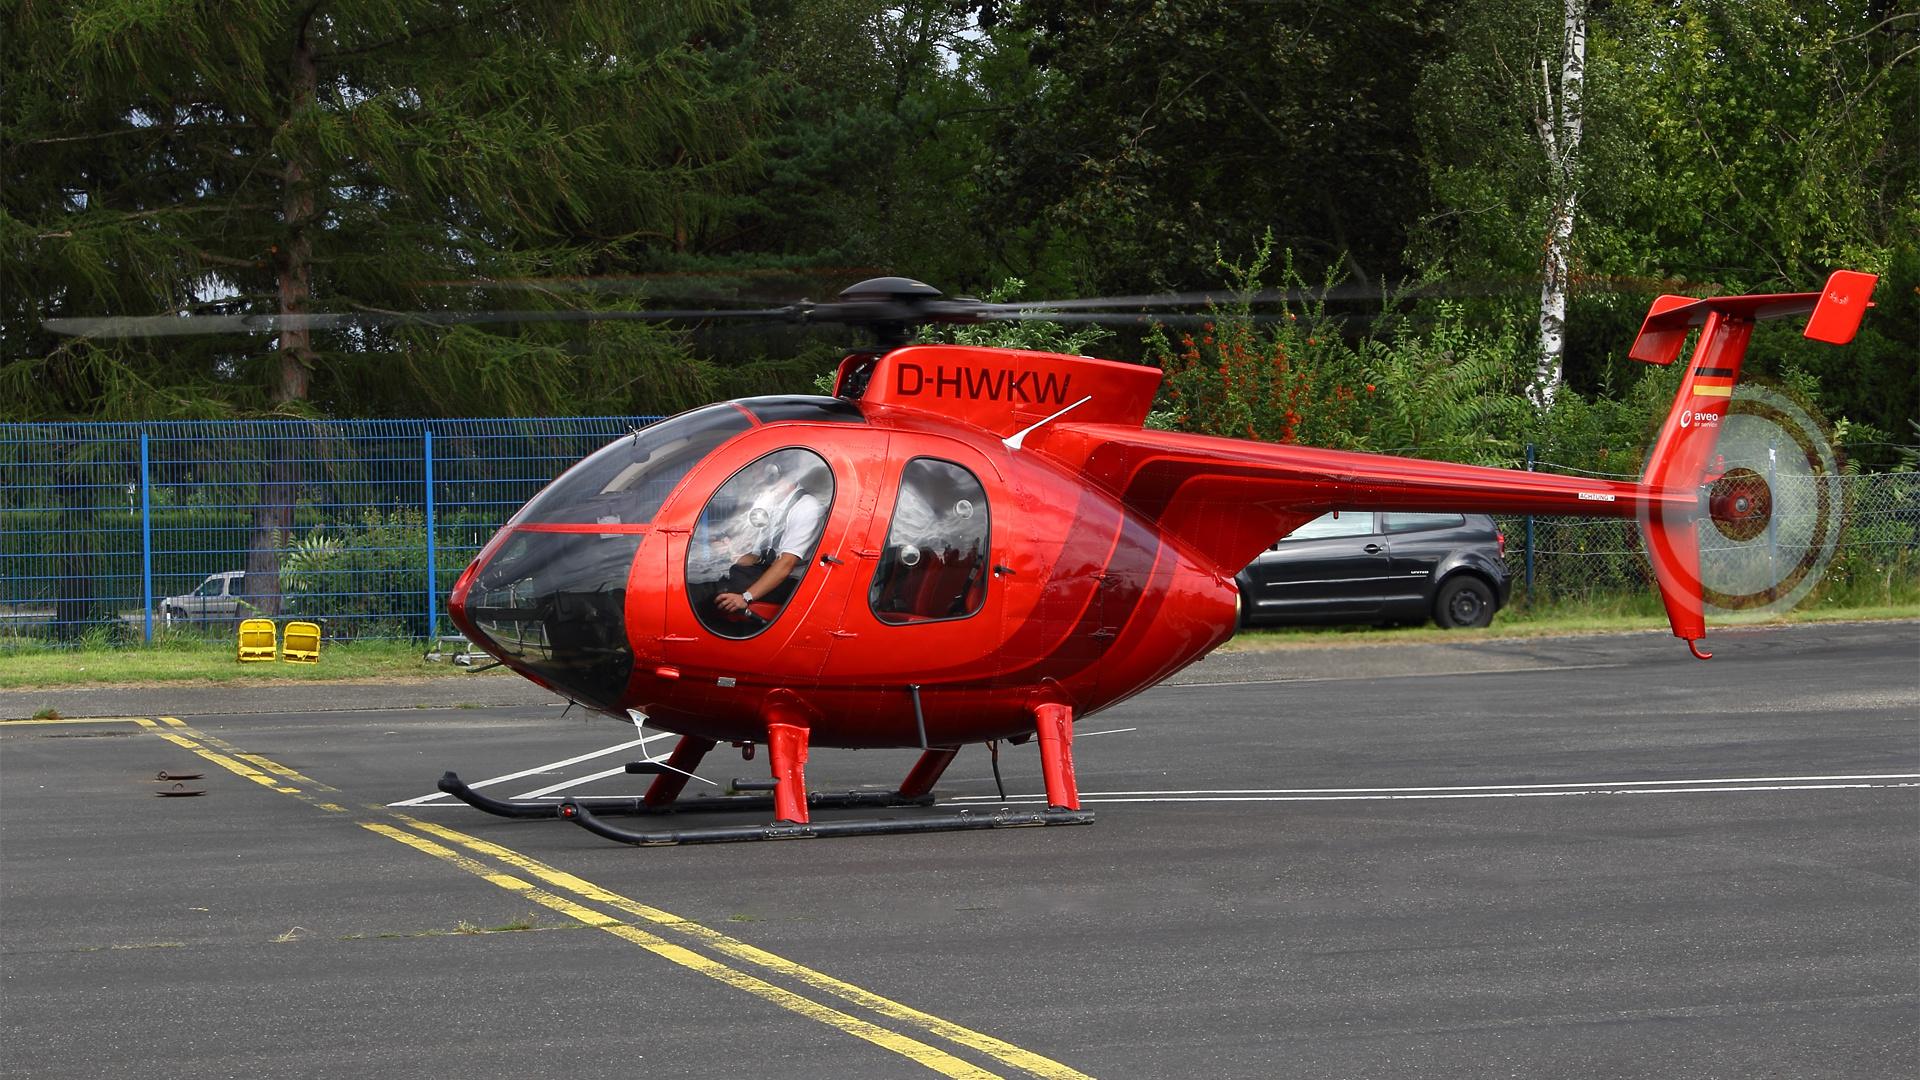 D-HWKW-1 H300 ESS 201412